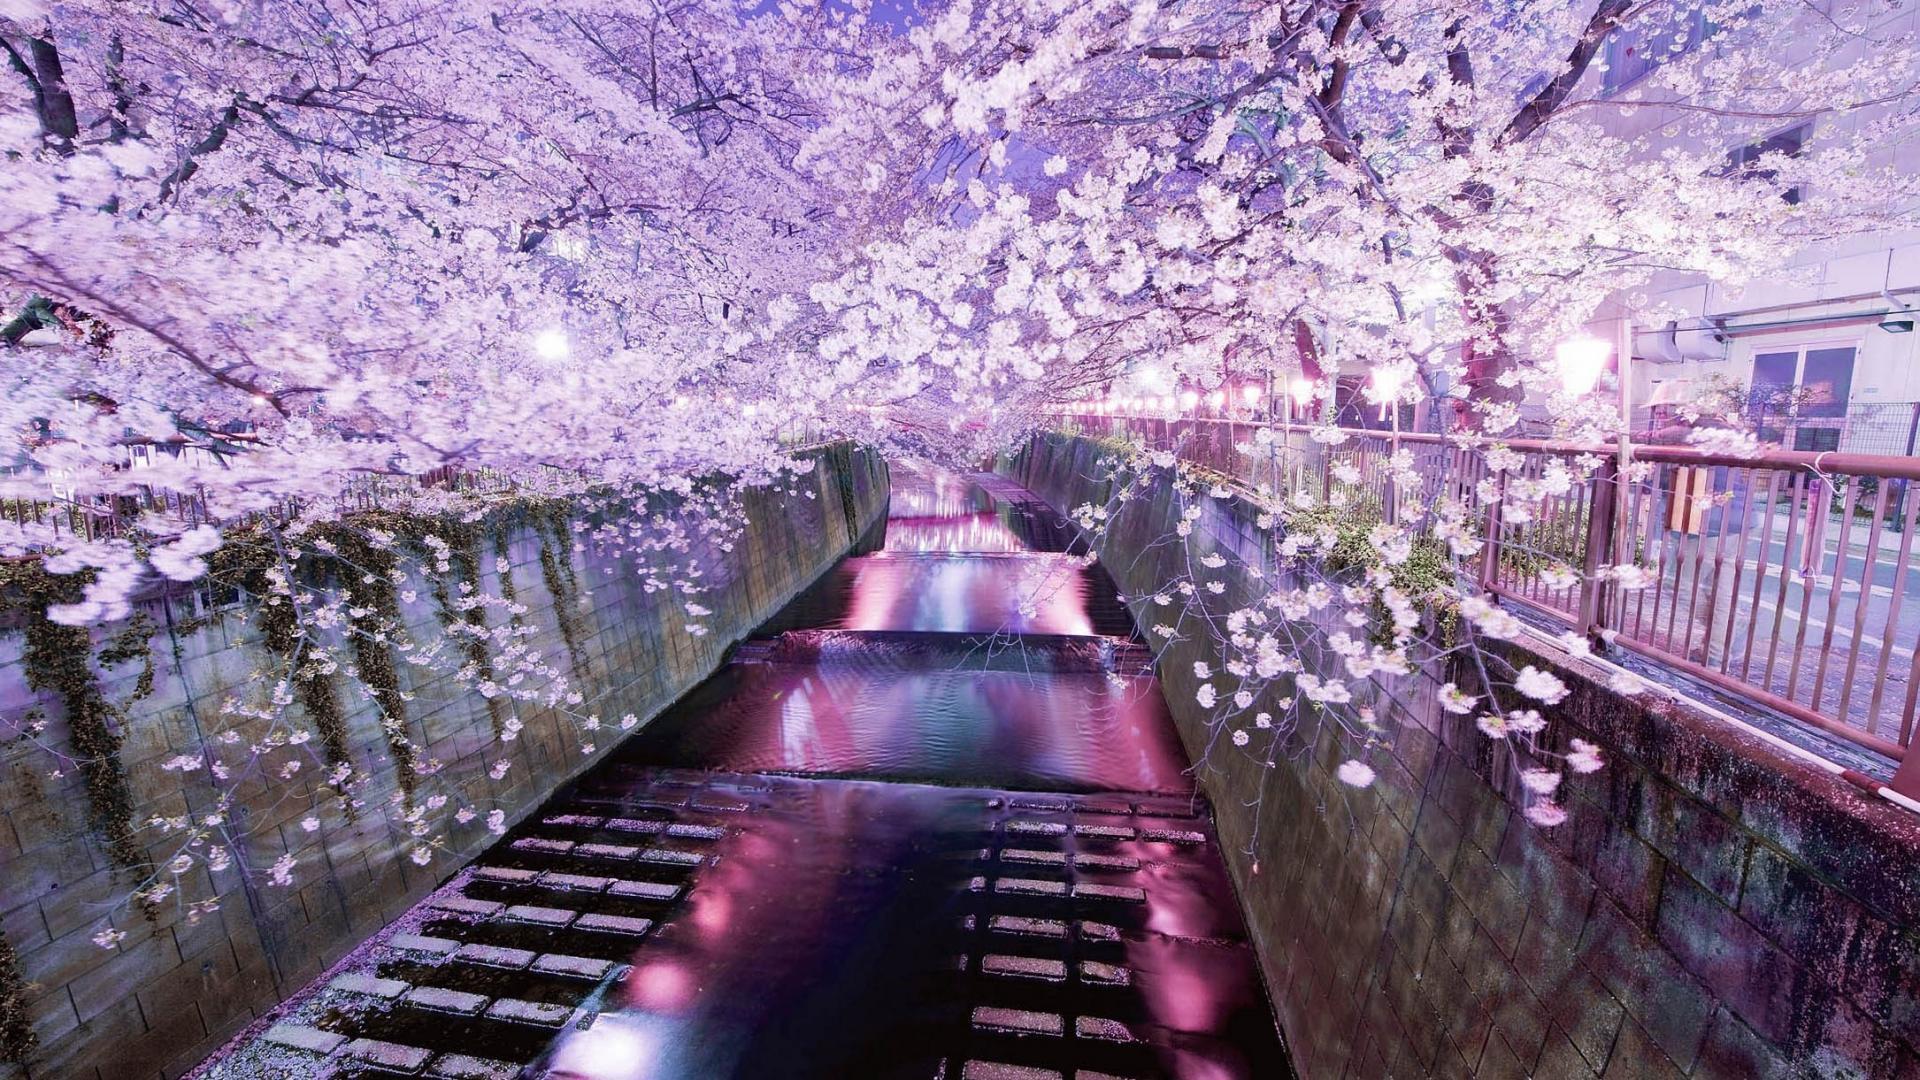 Japan Laptop Wallpapers Top Free Japan Laptop Backgrounds Wallpaperaccess